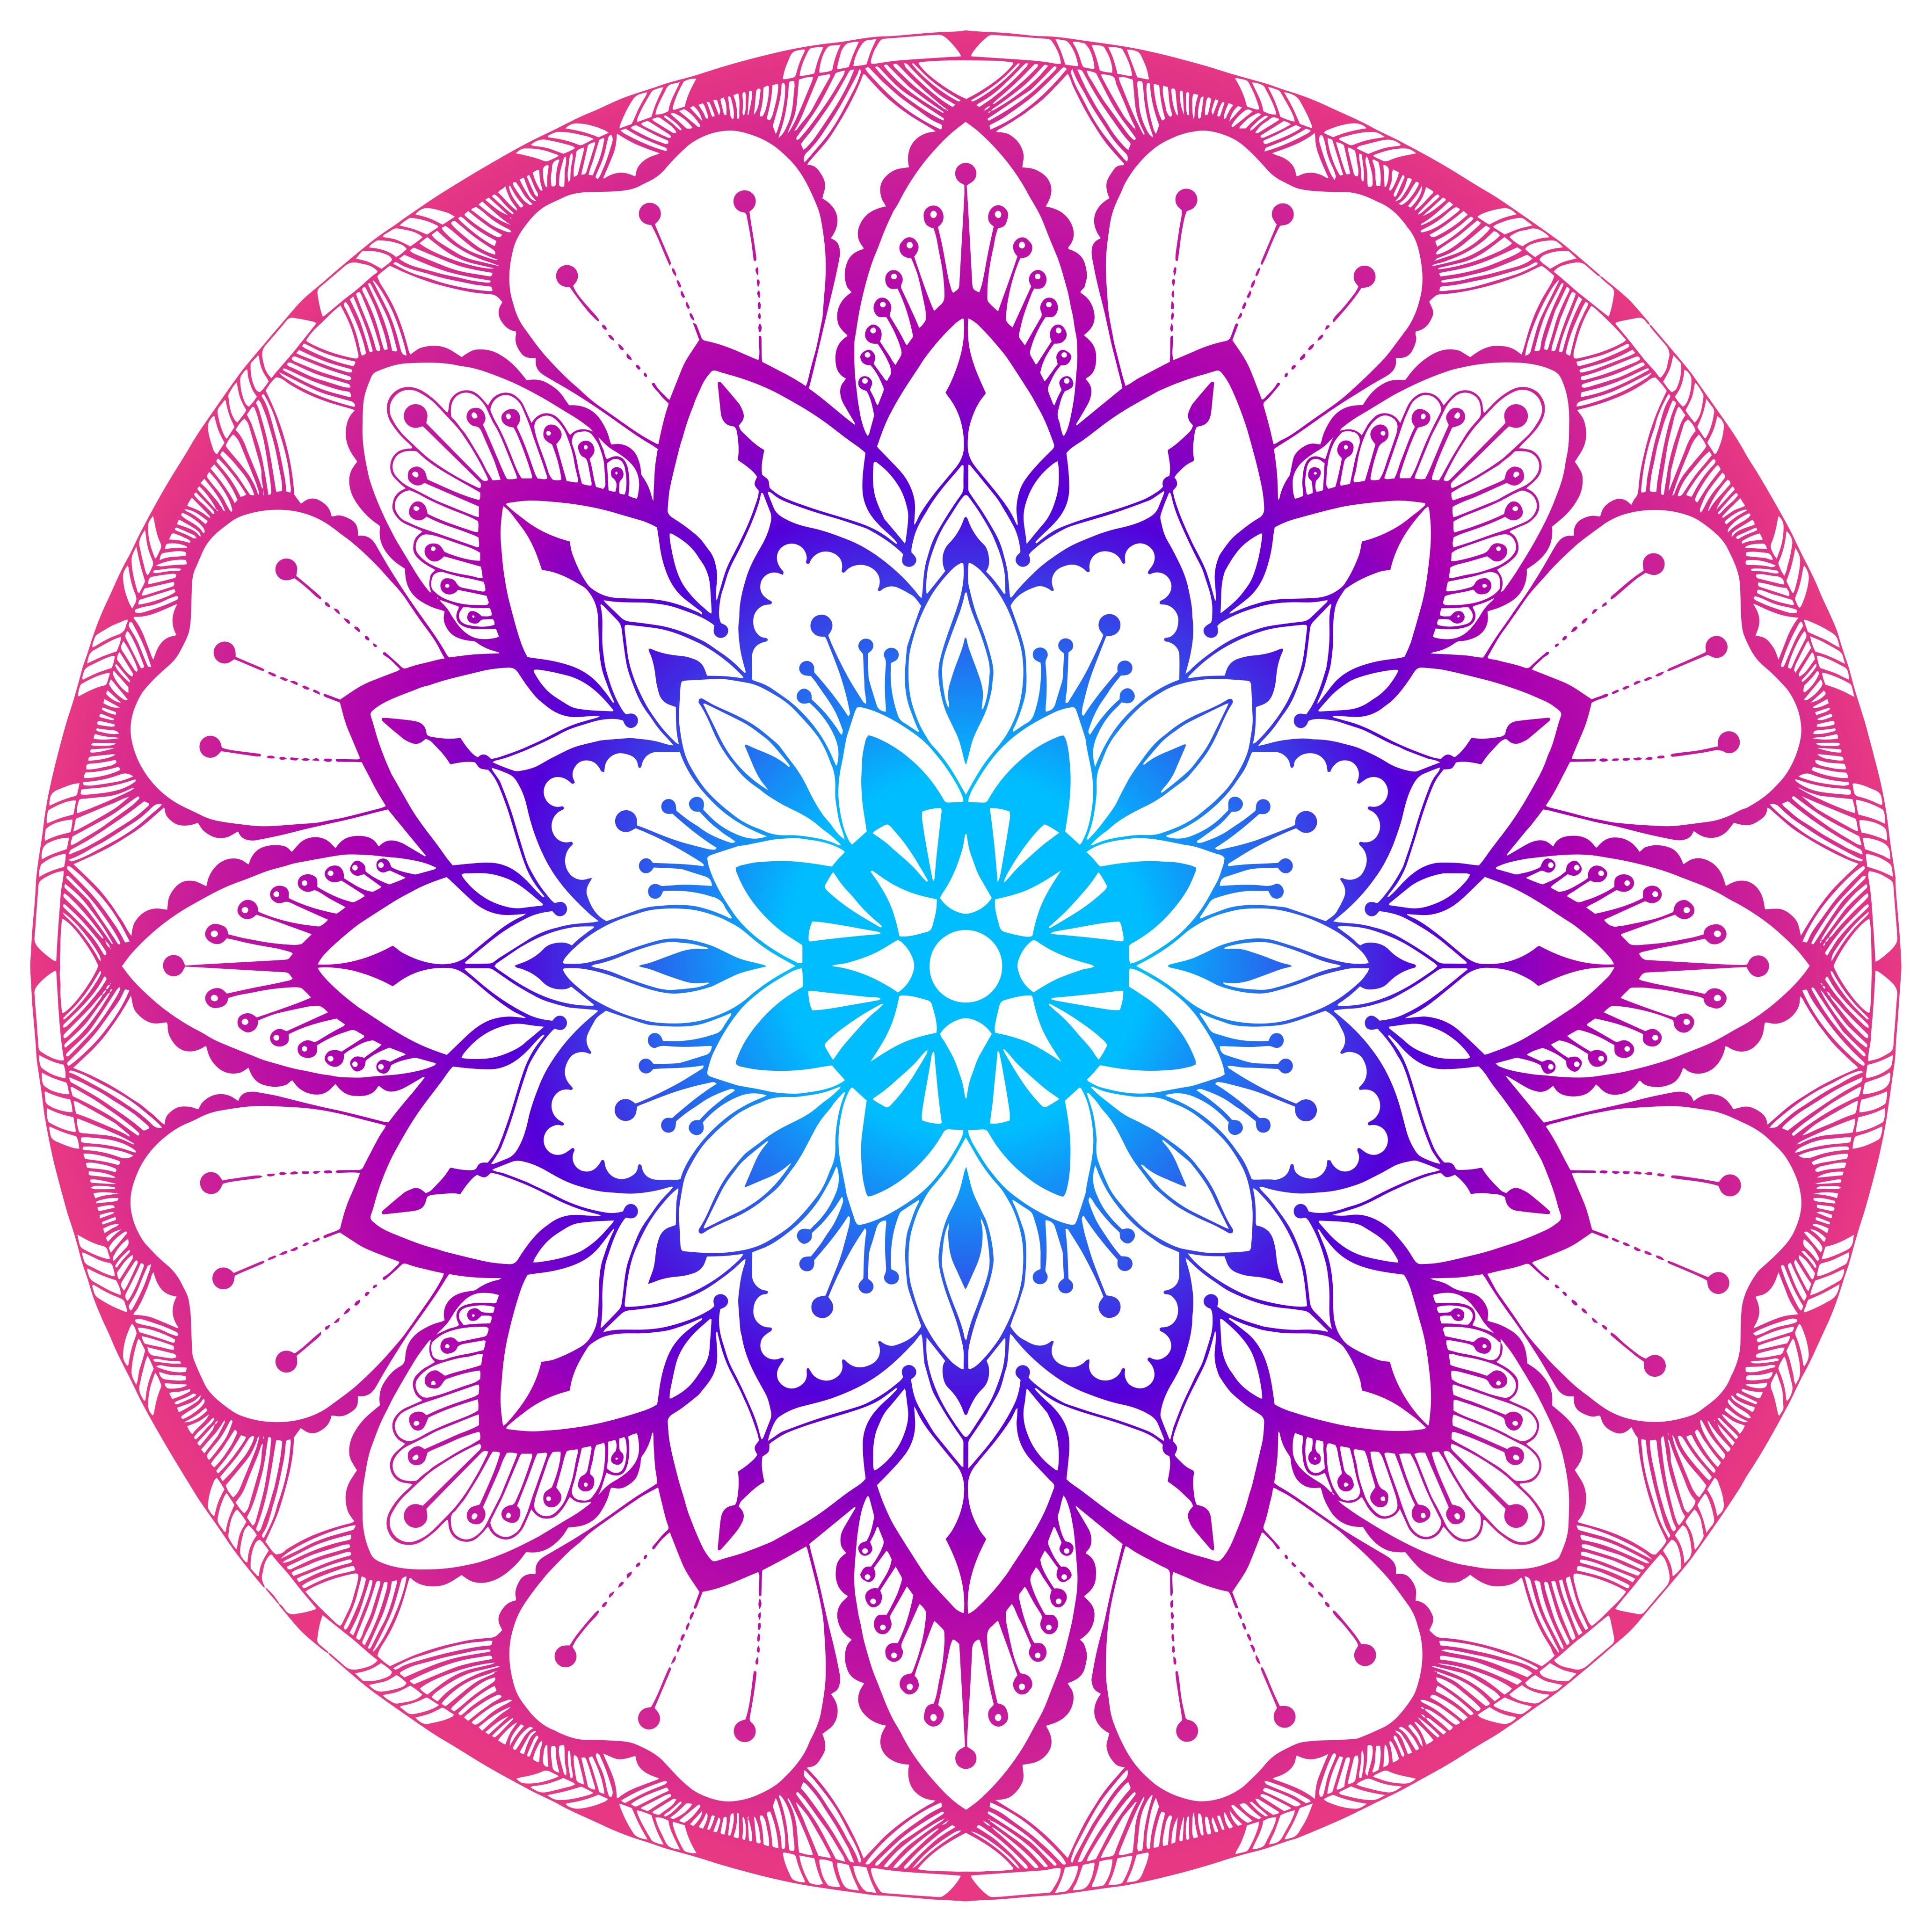 TenStickers. κυκλικό μπλε και μοβ χαλί μάνταλα. ένα όμορφο κυκλικό μπλε και μοβ χαλί μάνταλα κατασκευασμένο για να διακοσμήσει τους χώρους του σπιτιού σας με τις καλύτερες ατμόσφαιρες. εύκολο στην εφαρμογή.